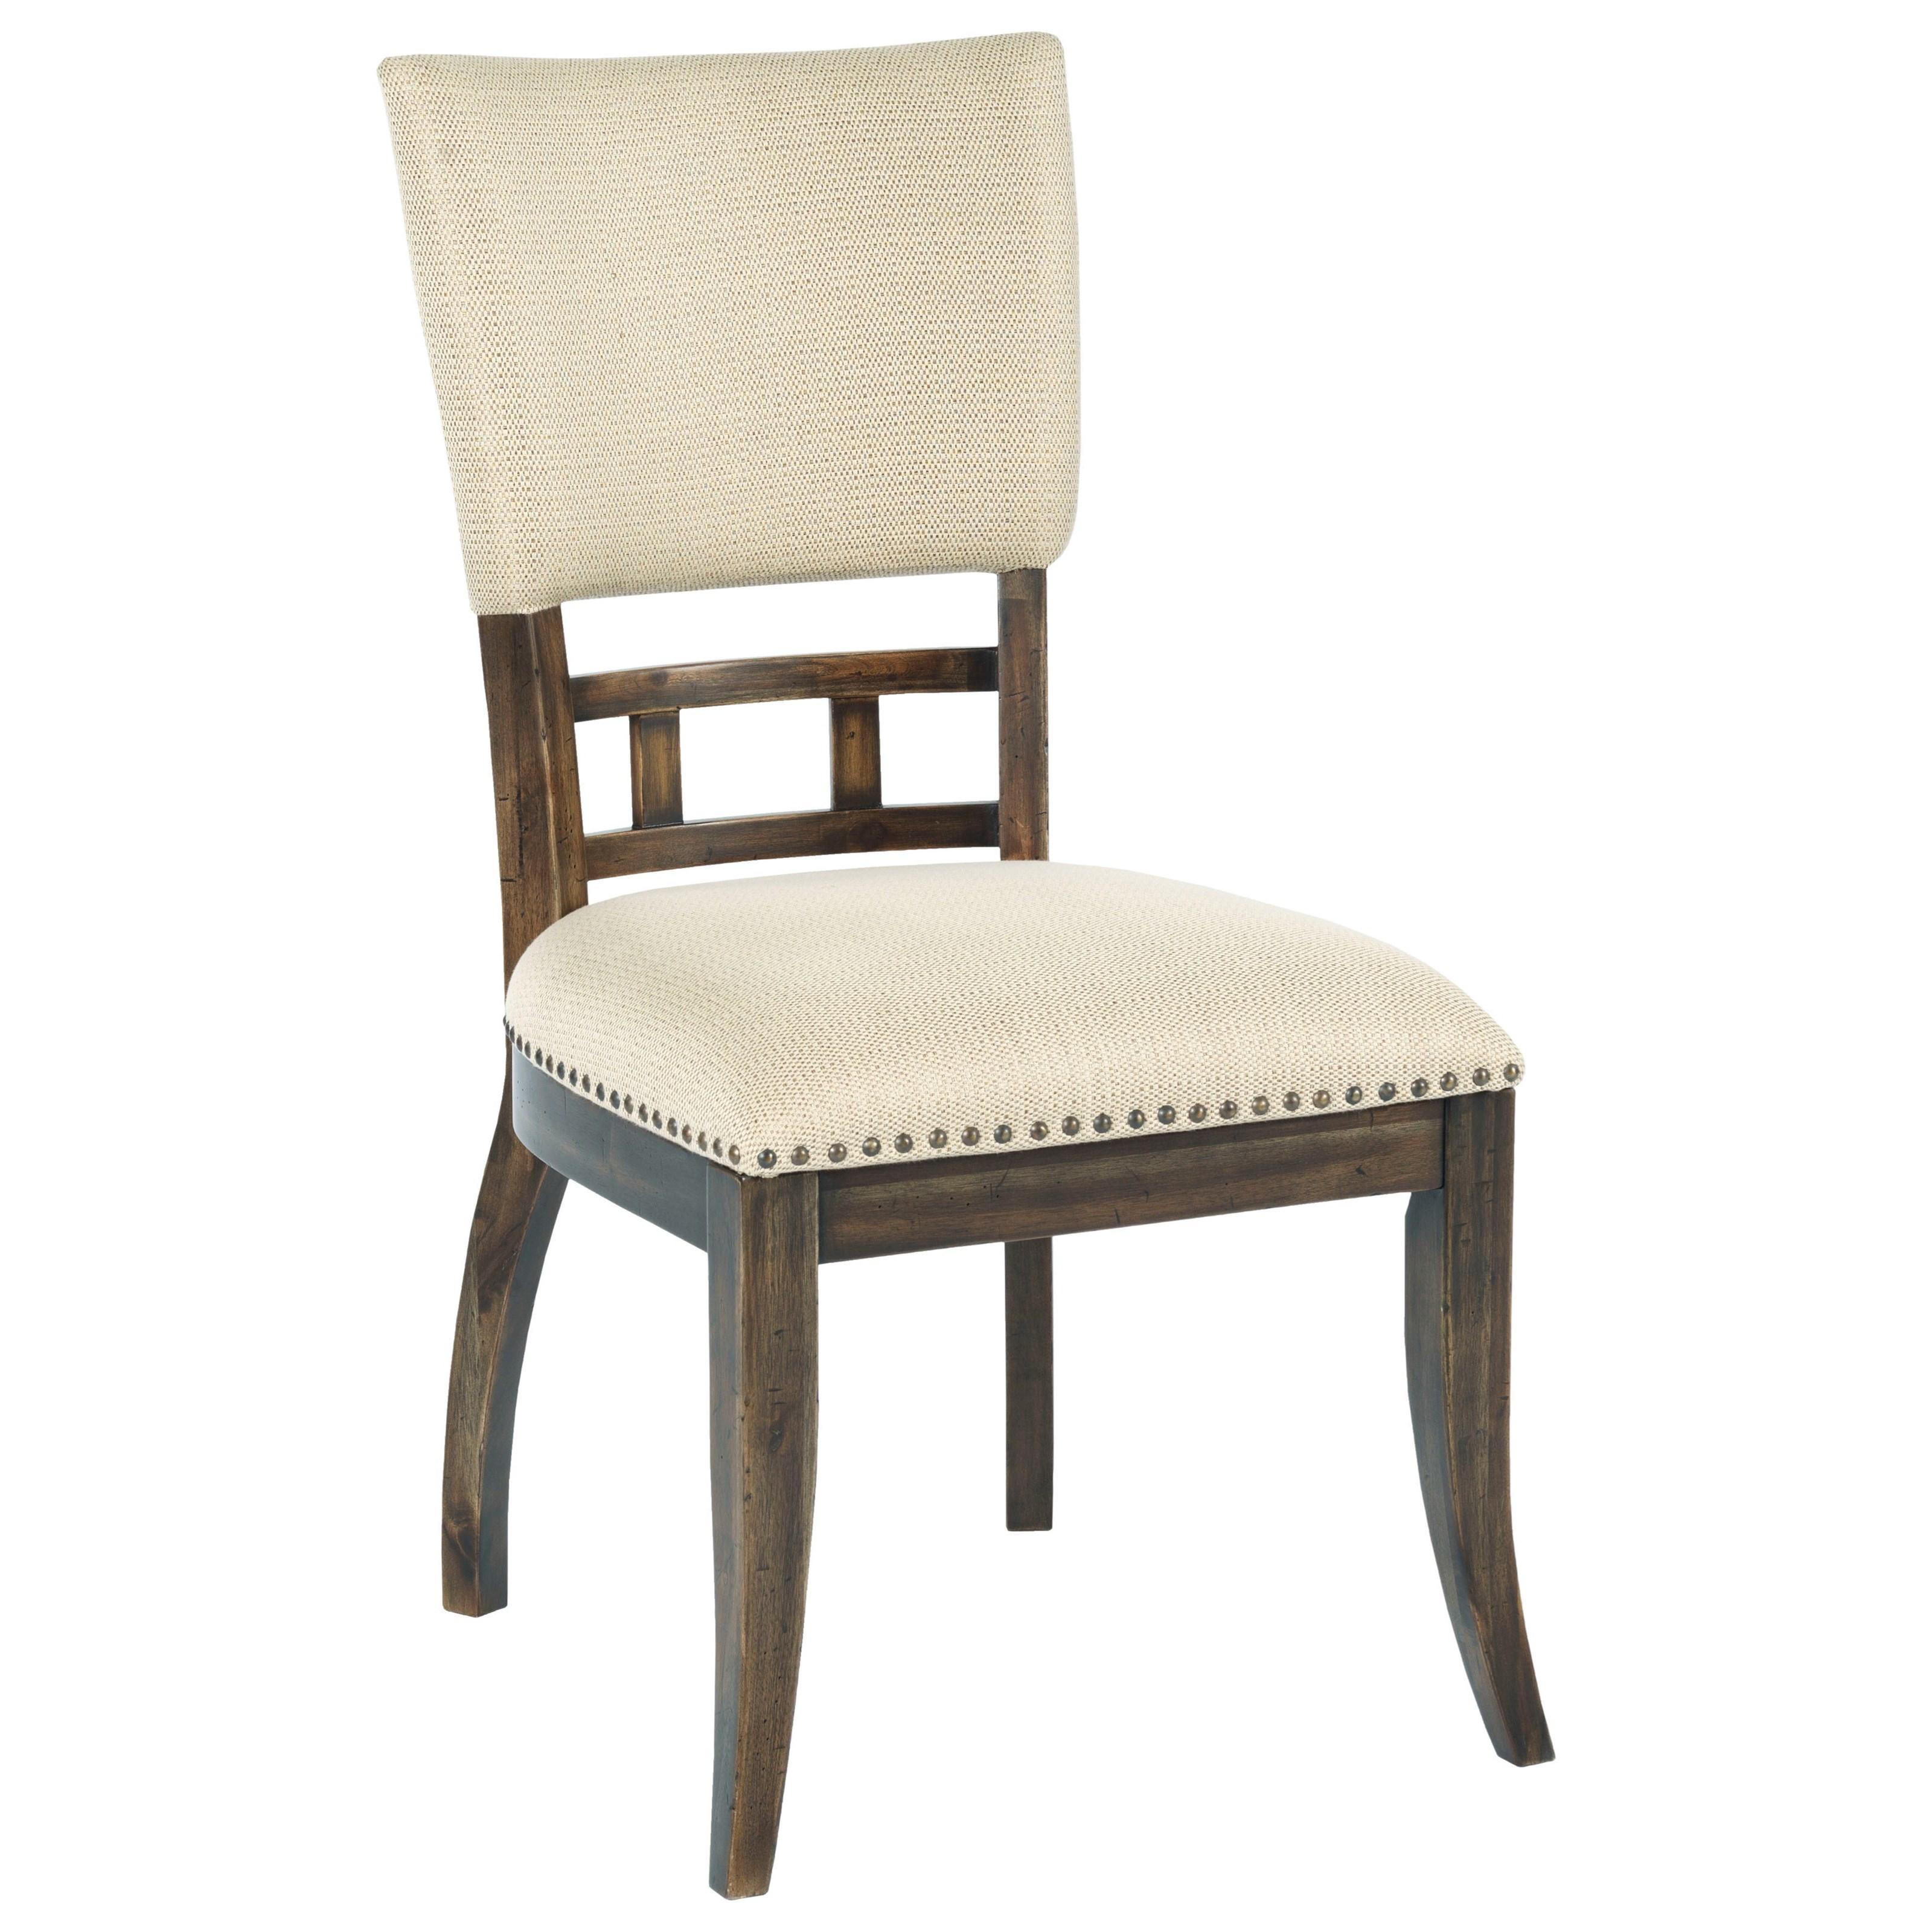 Kincaid Furniture Wildfire Tweed Side Chair - Item Number: 86-063